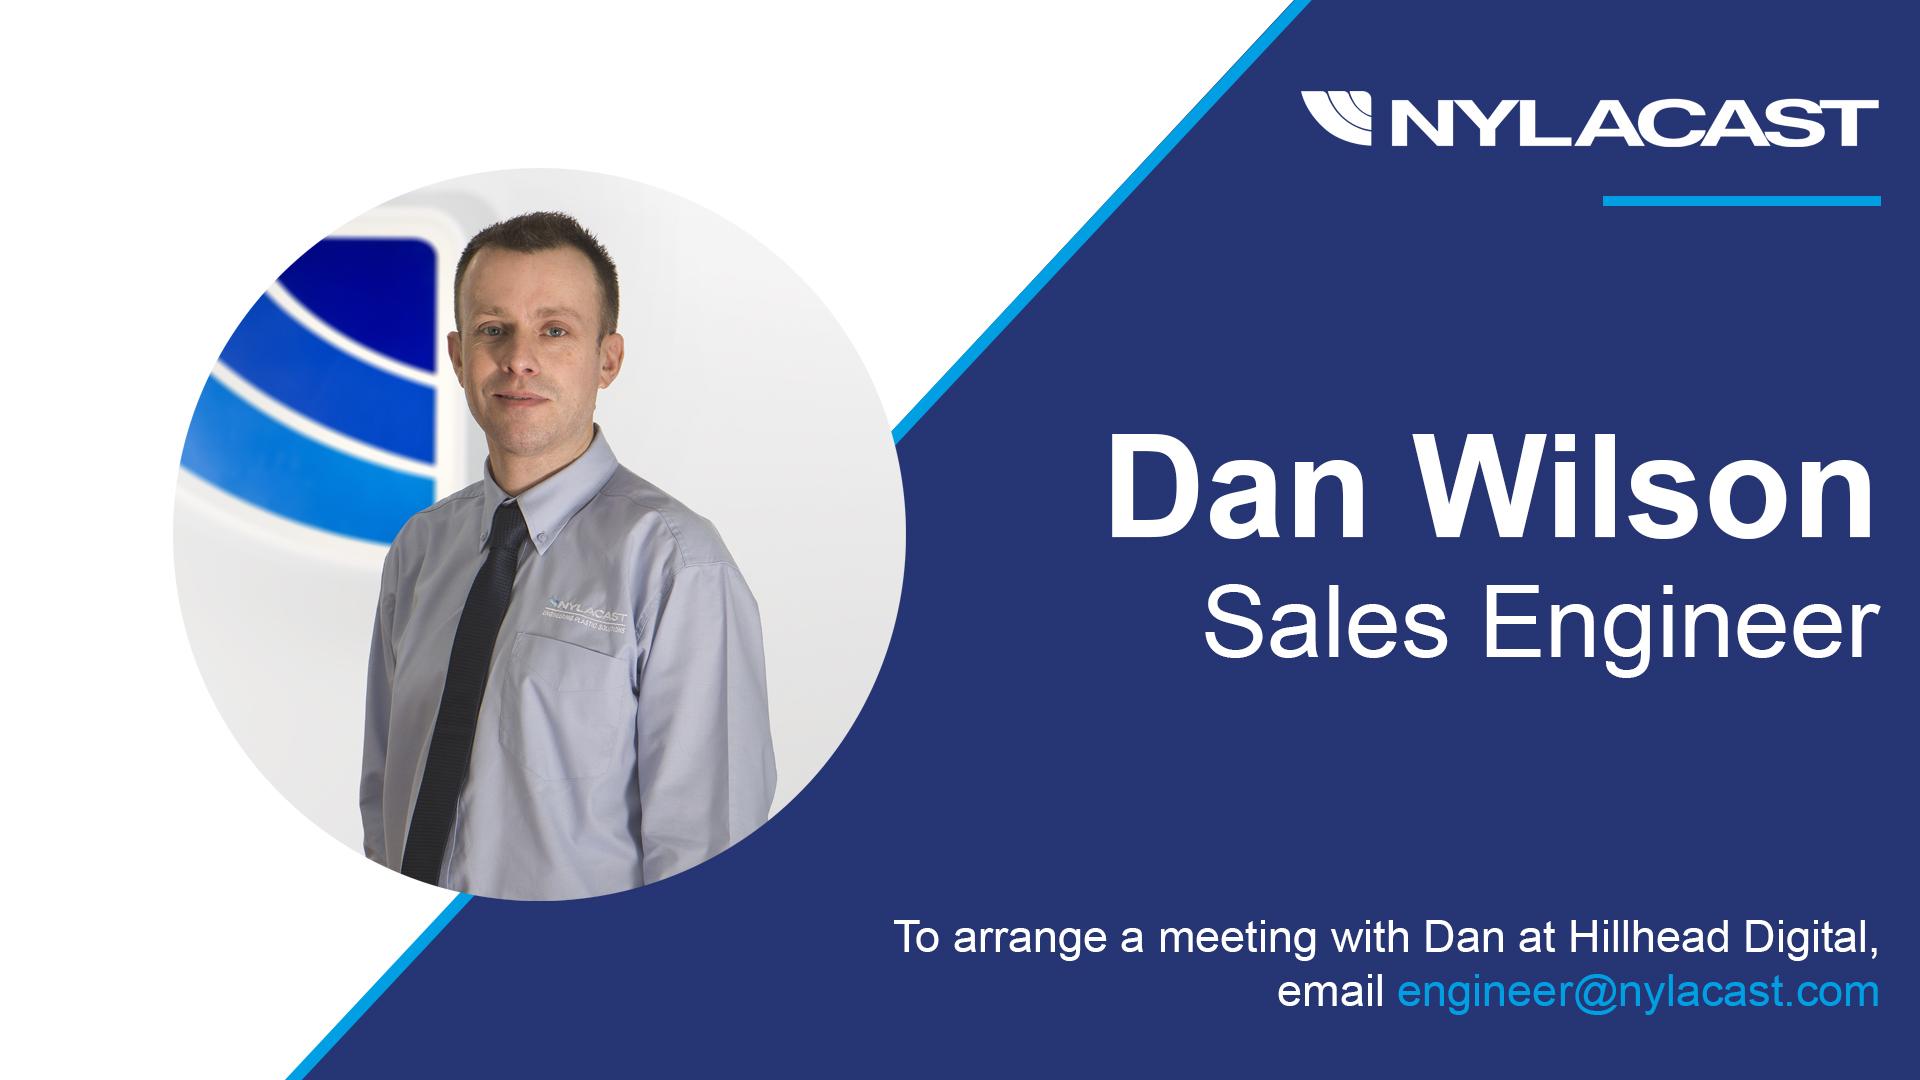 Dan Wilson at Hillhead Digital Stand For Nylacast